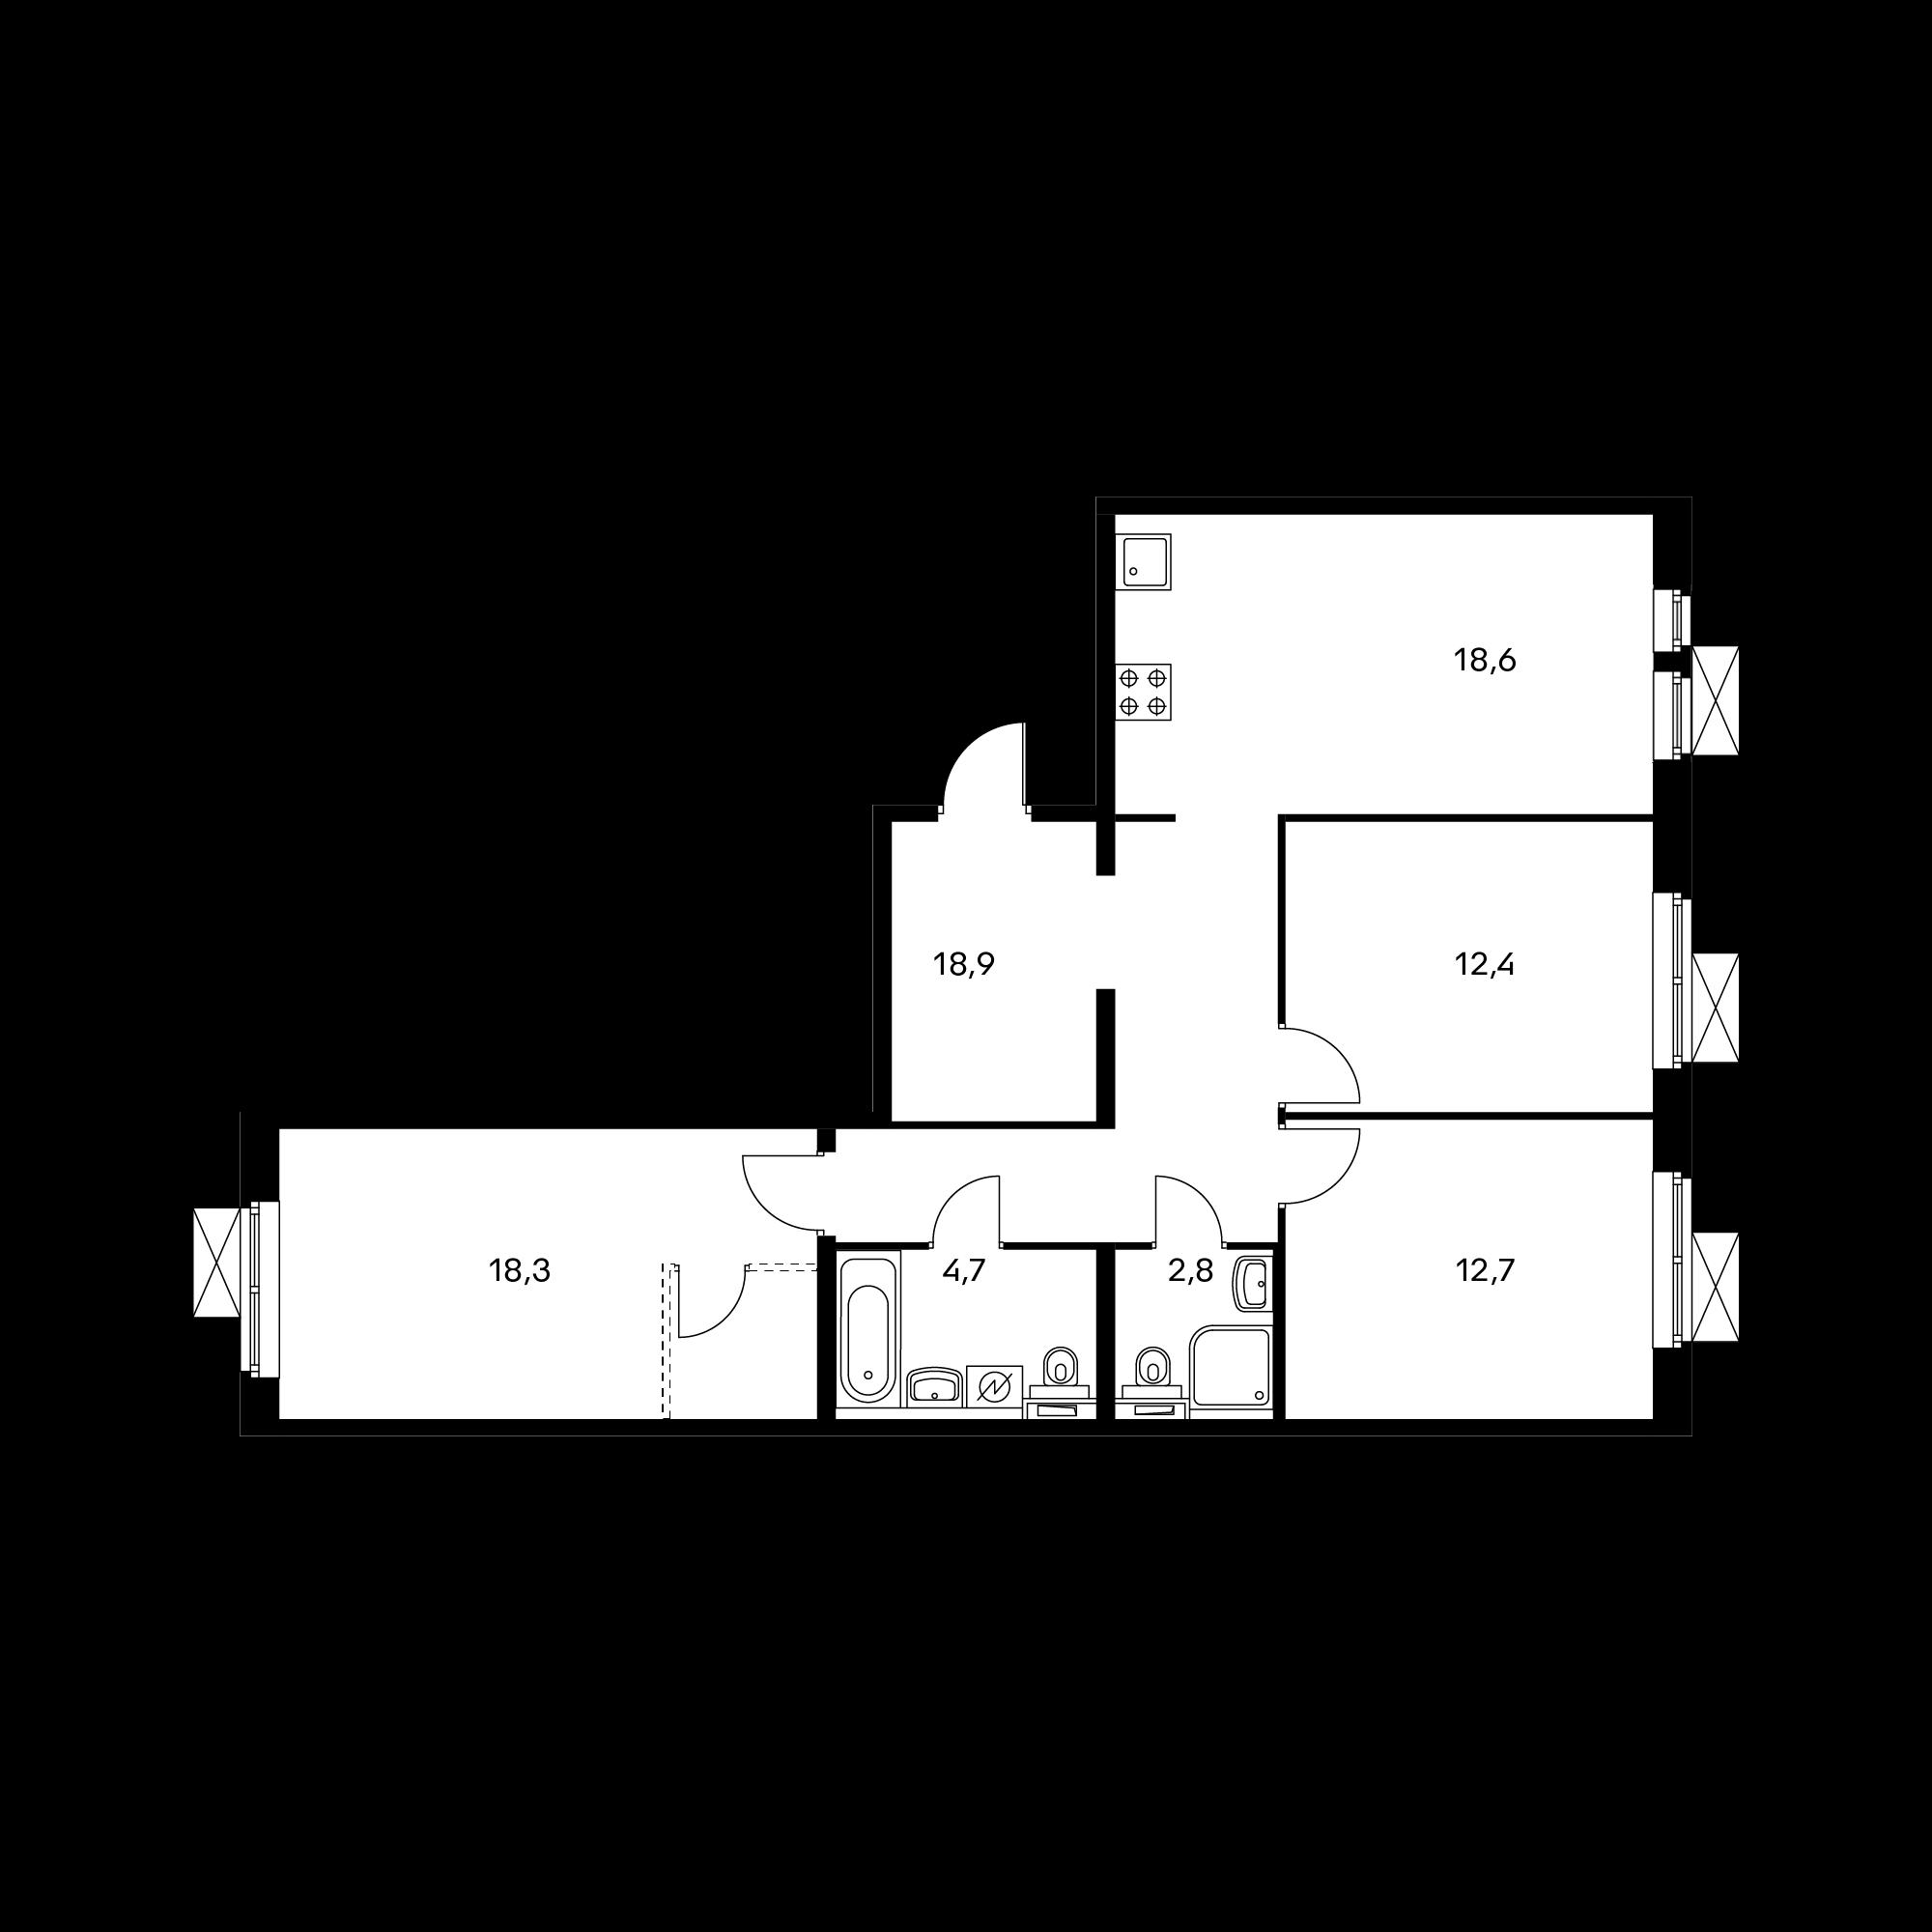 3EL3_9.9-3*